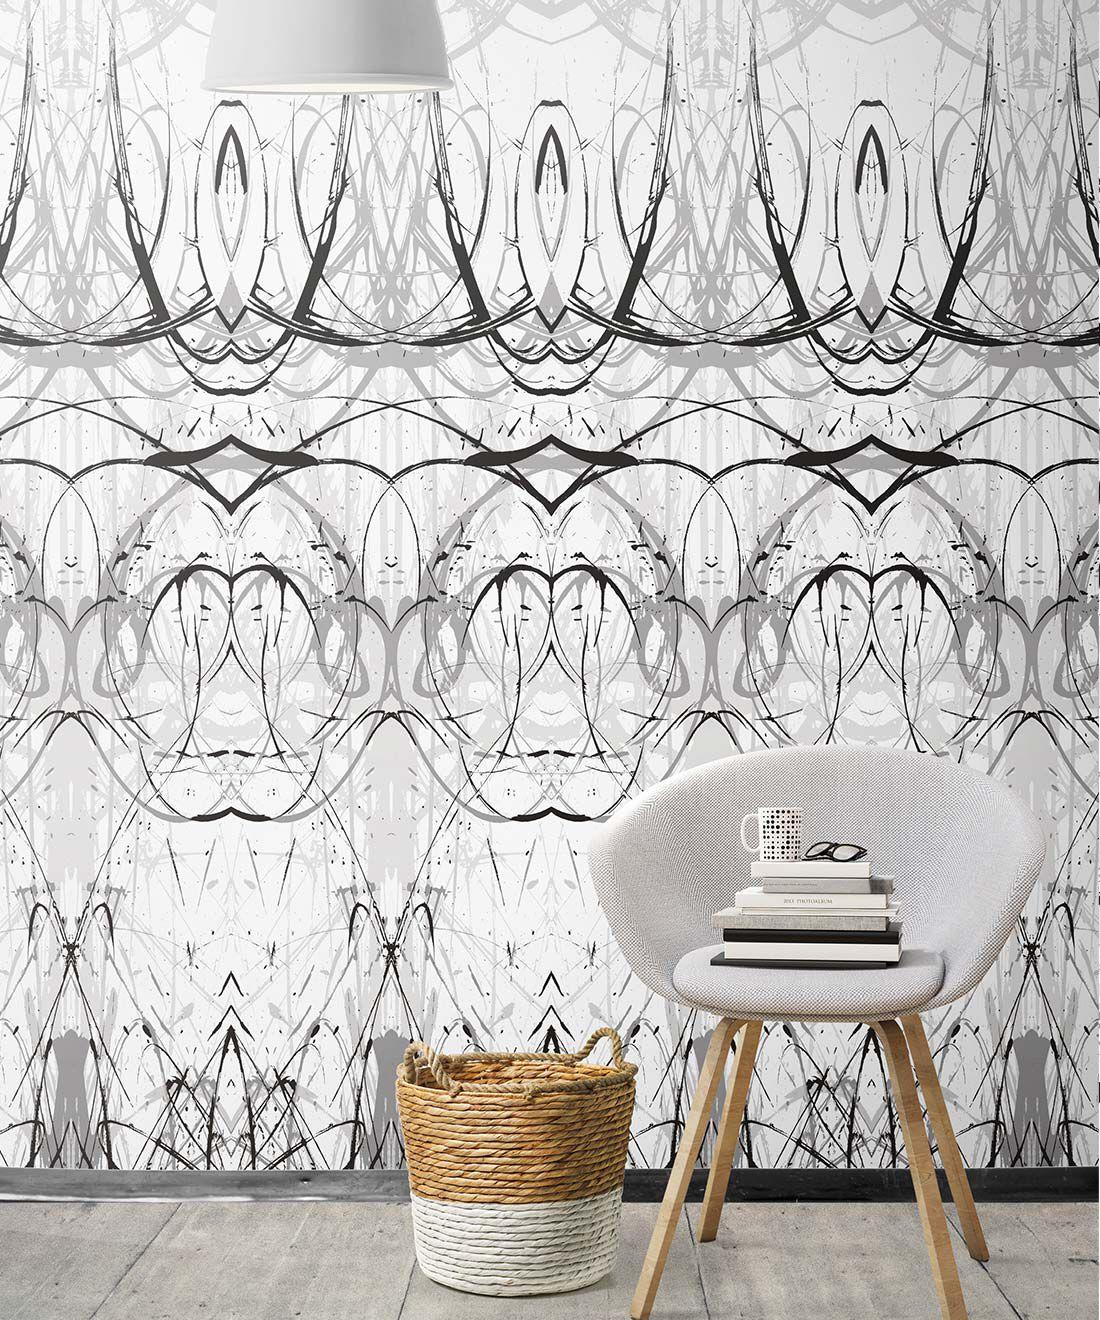 Penthu Wallpaper by Simcox • Color Black & White • Contemporary Wallpaper • insitu